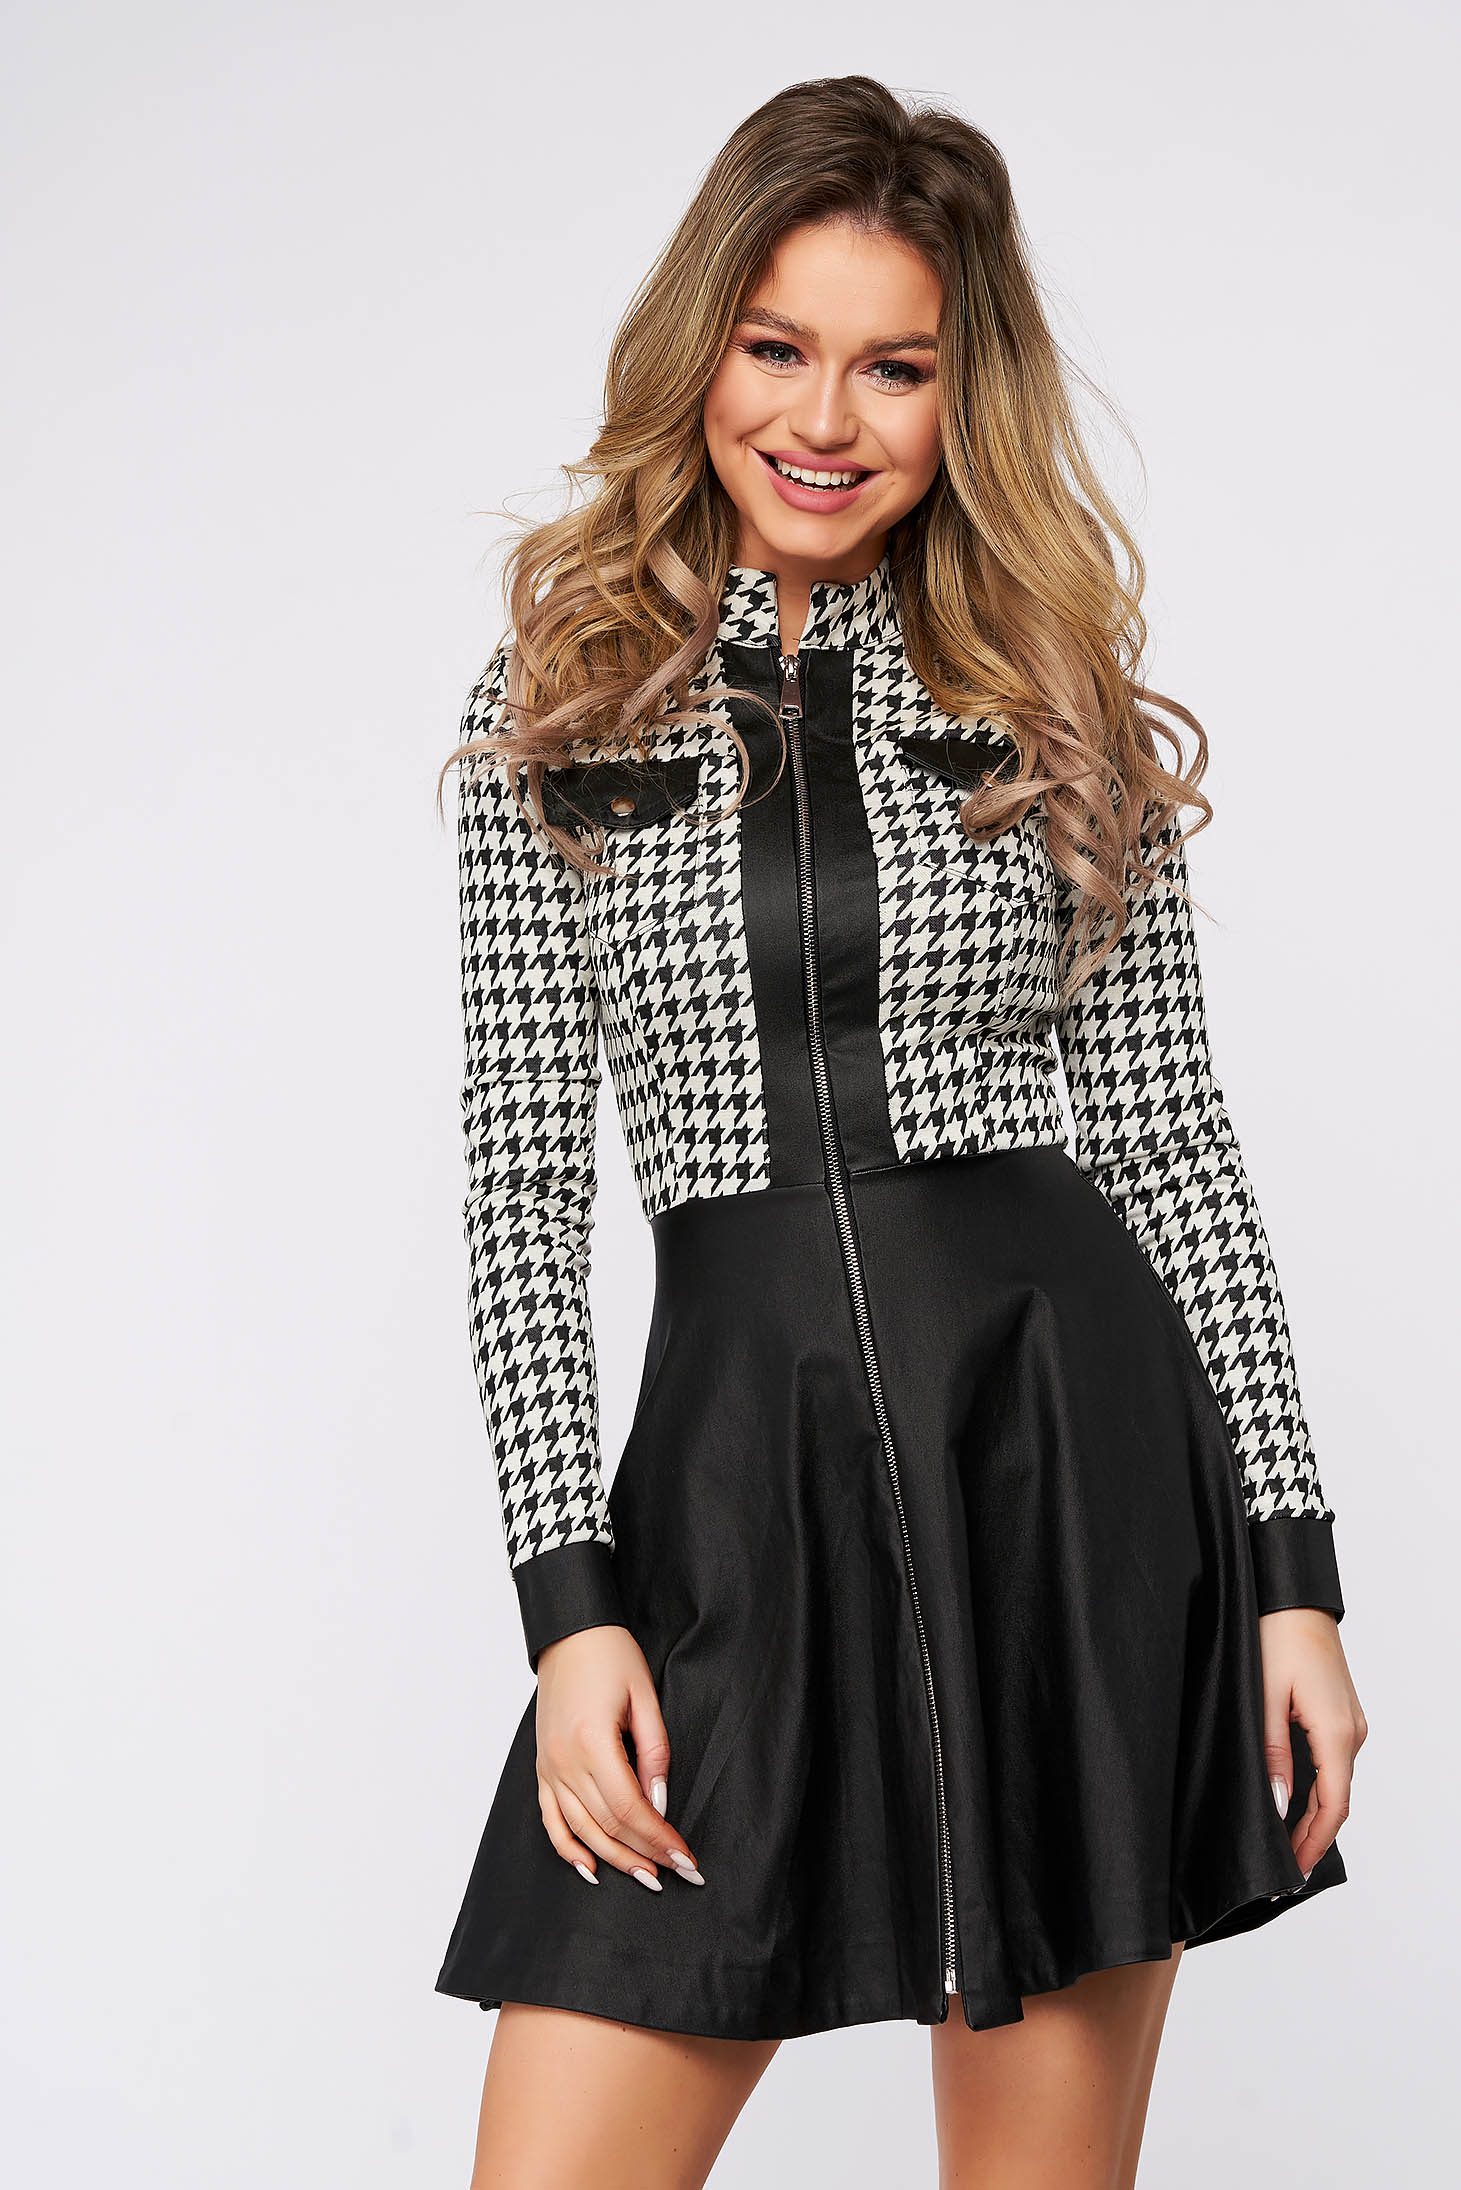 Dress black from elastic fabric zipper fastening dogtooth cloche